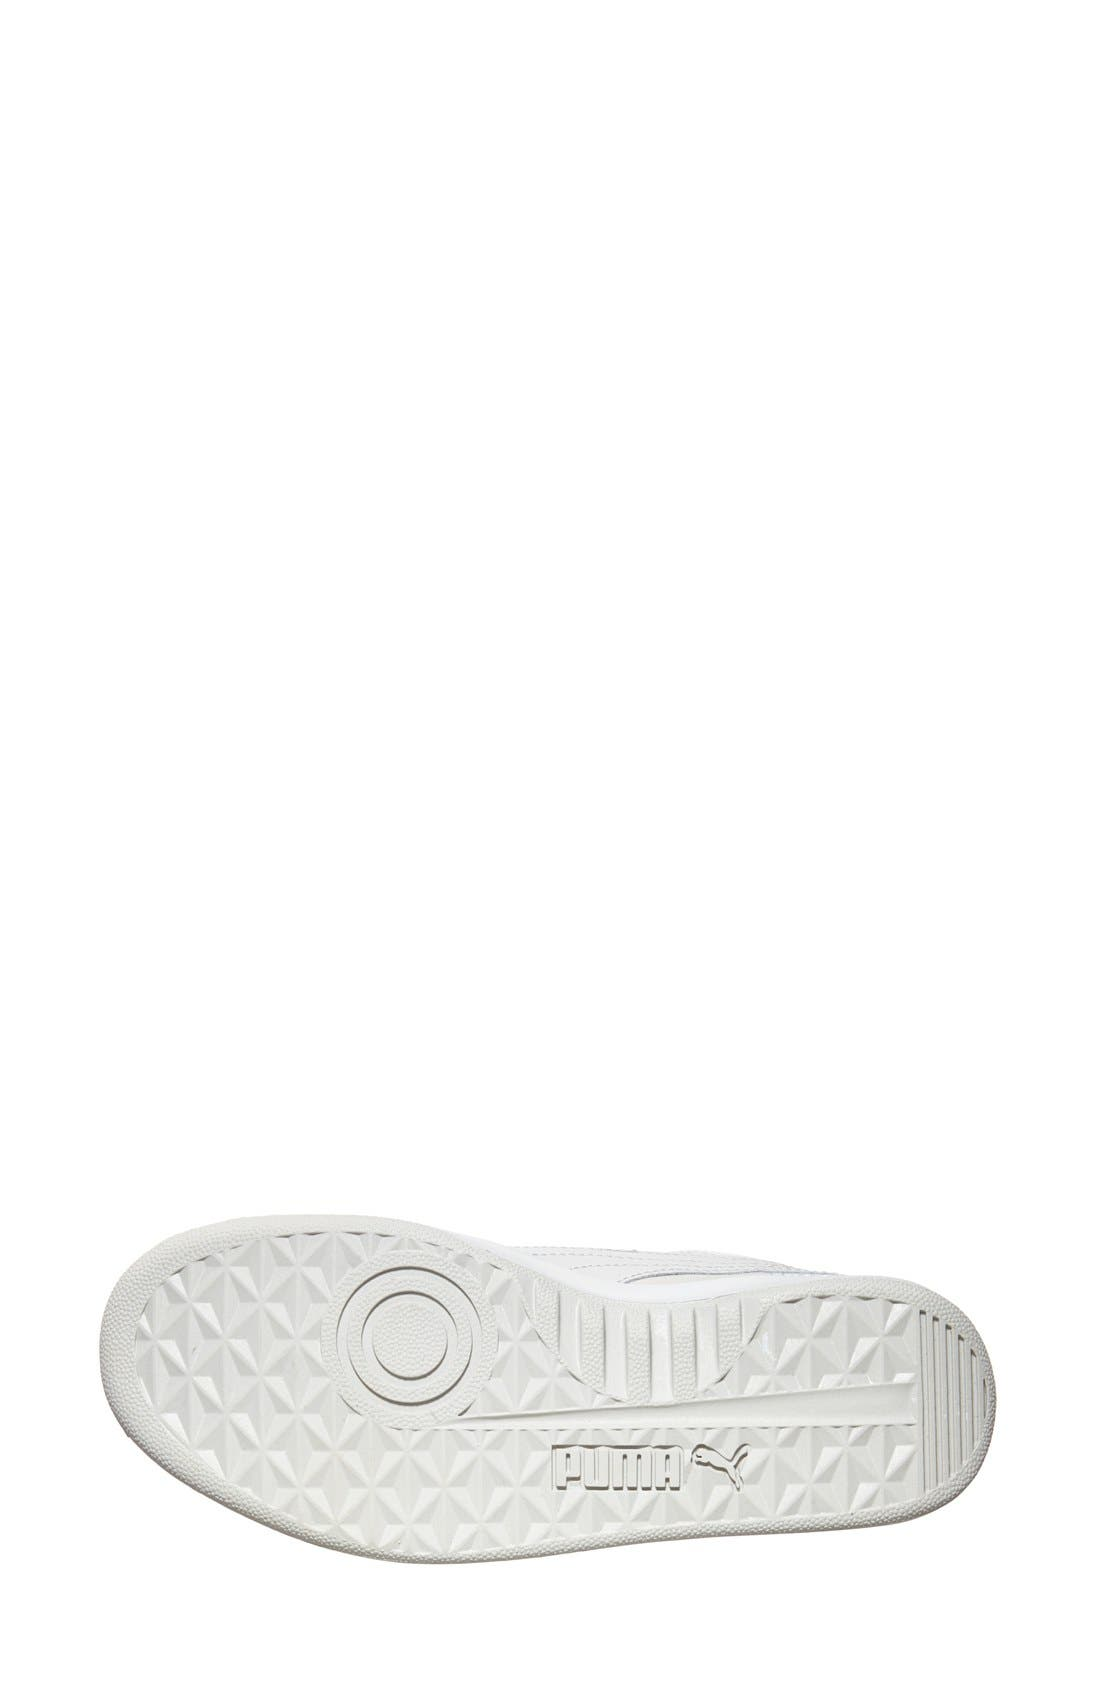 Alternate Image 4  - PUMA 'G. Vilas - Blocks and Stripes' Sneaker (Women)